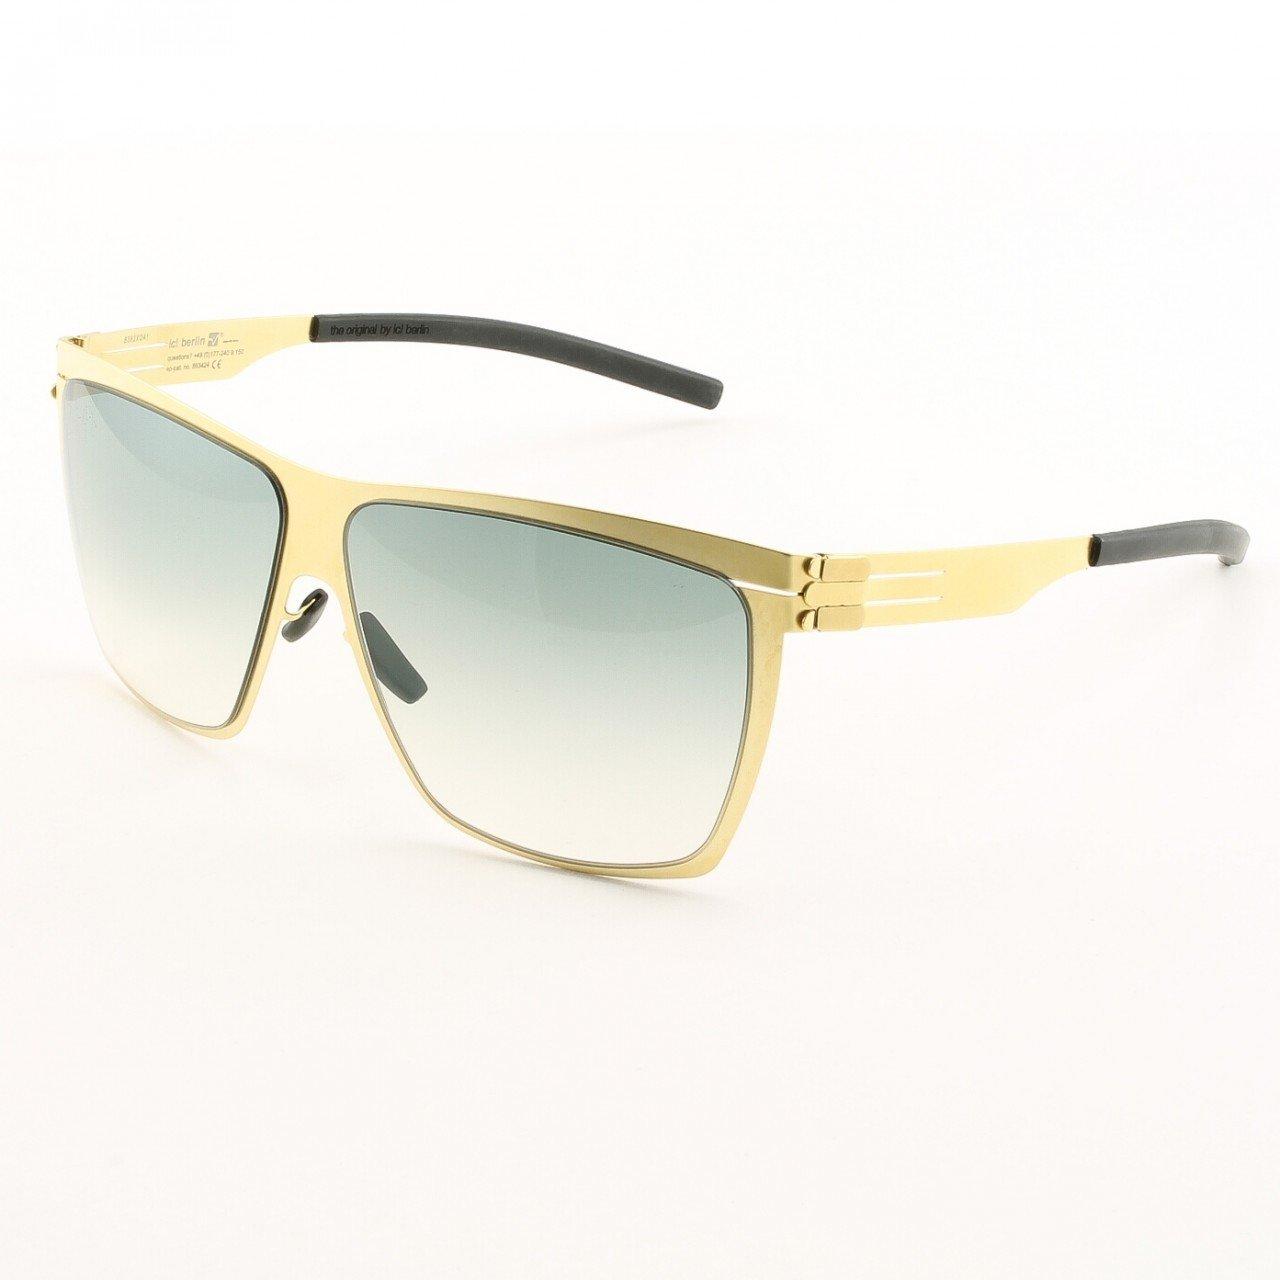 ic! Berlin Dark Energy Sunglasses Col. Gold with Black Gradient Lenses